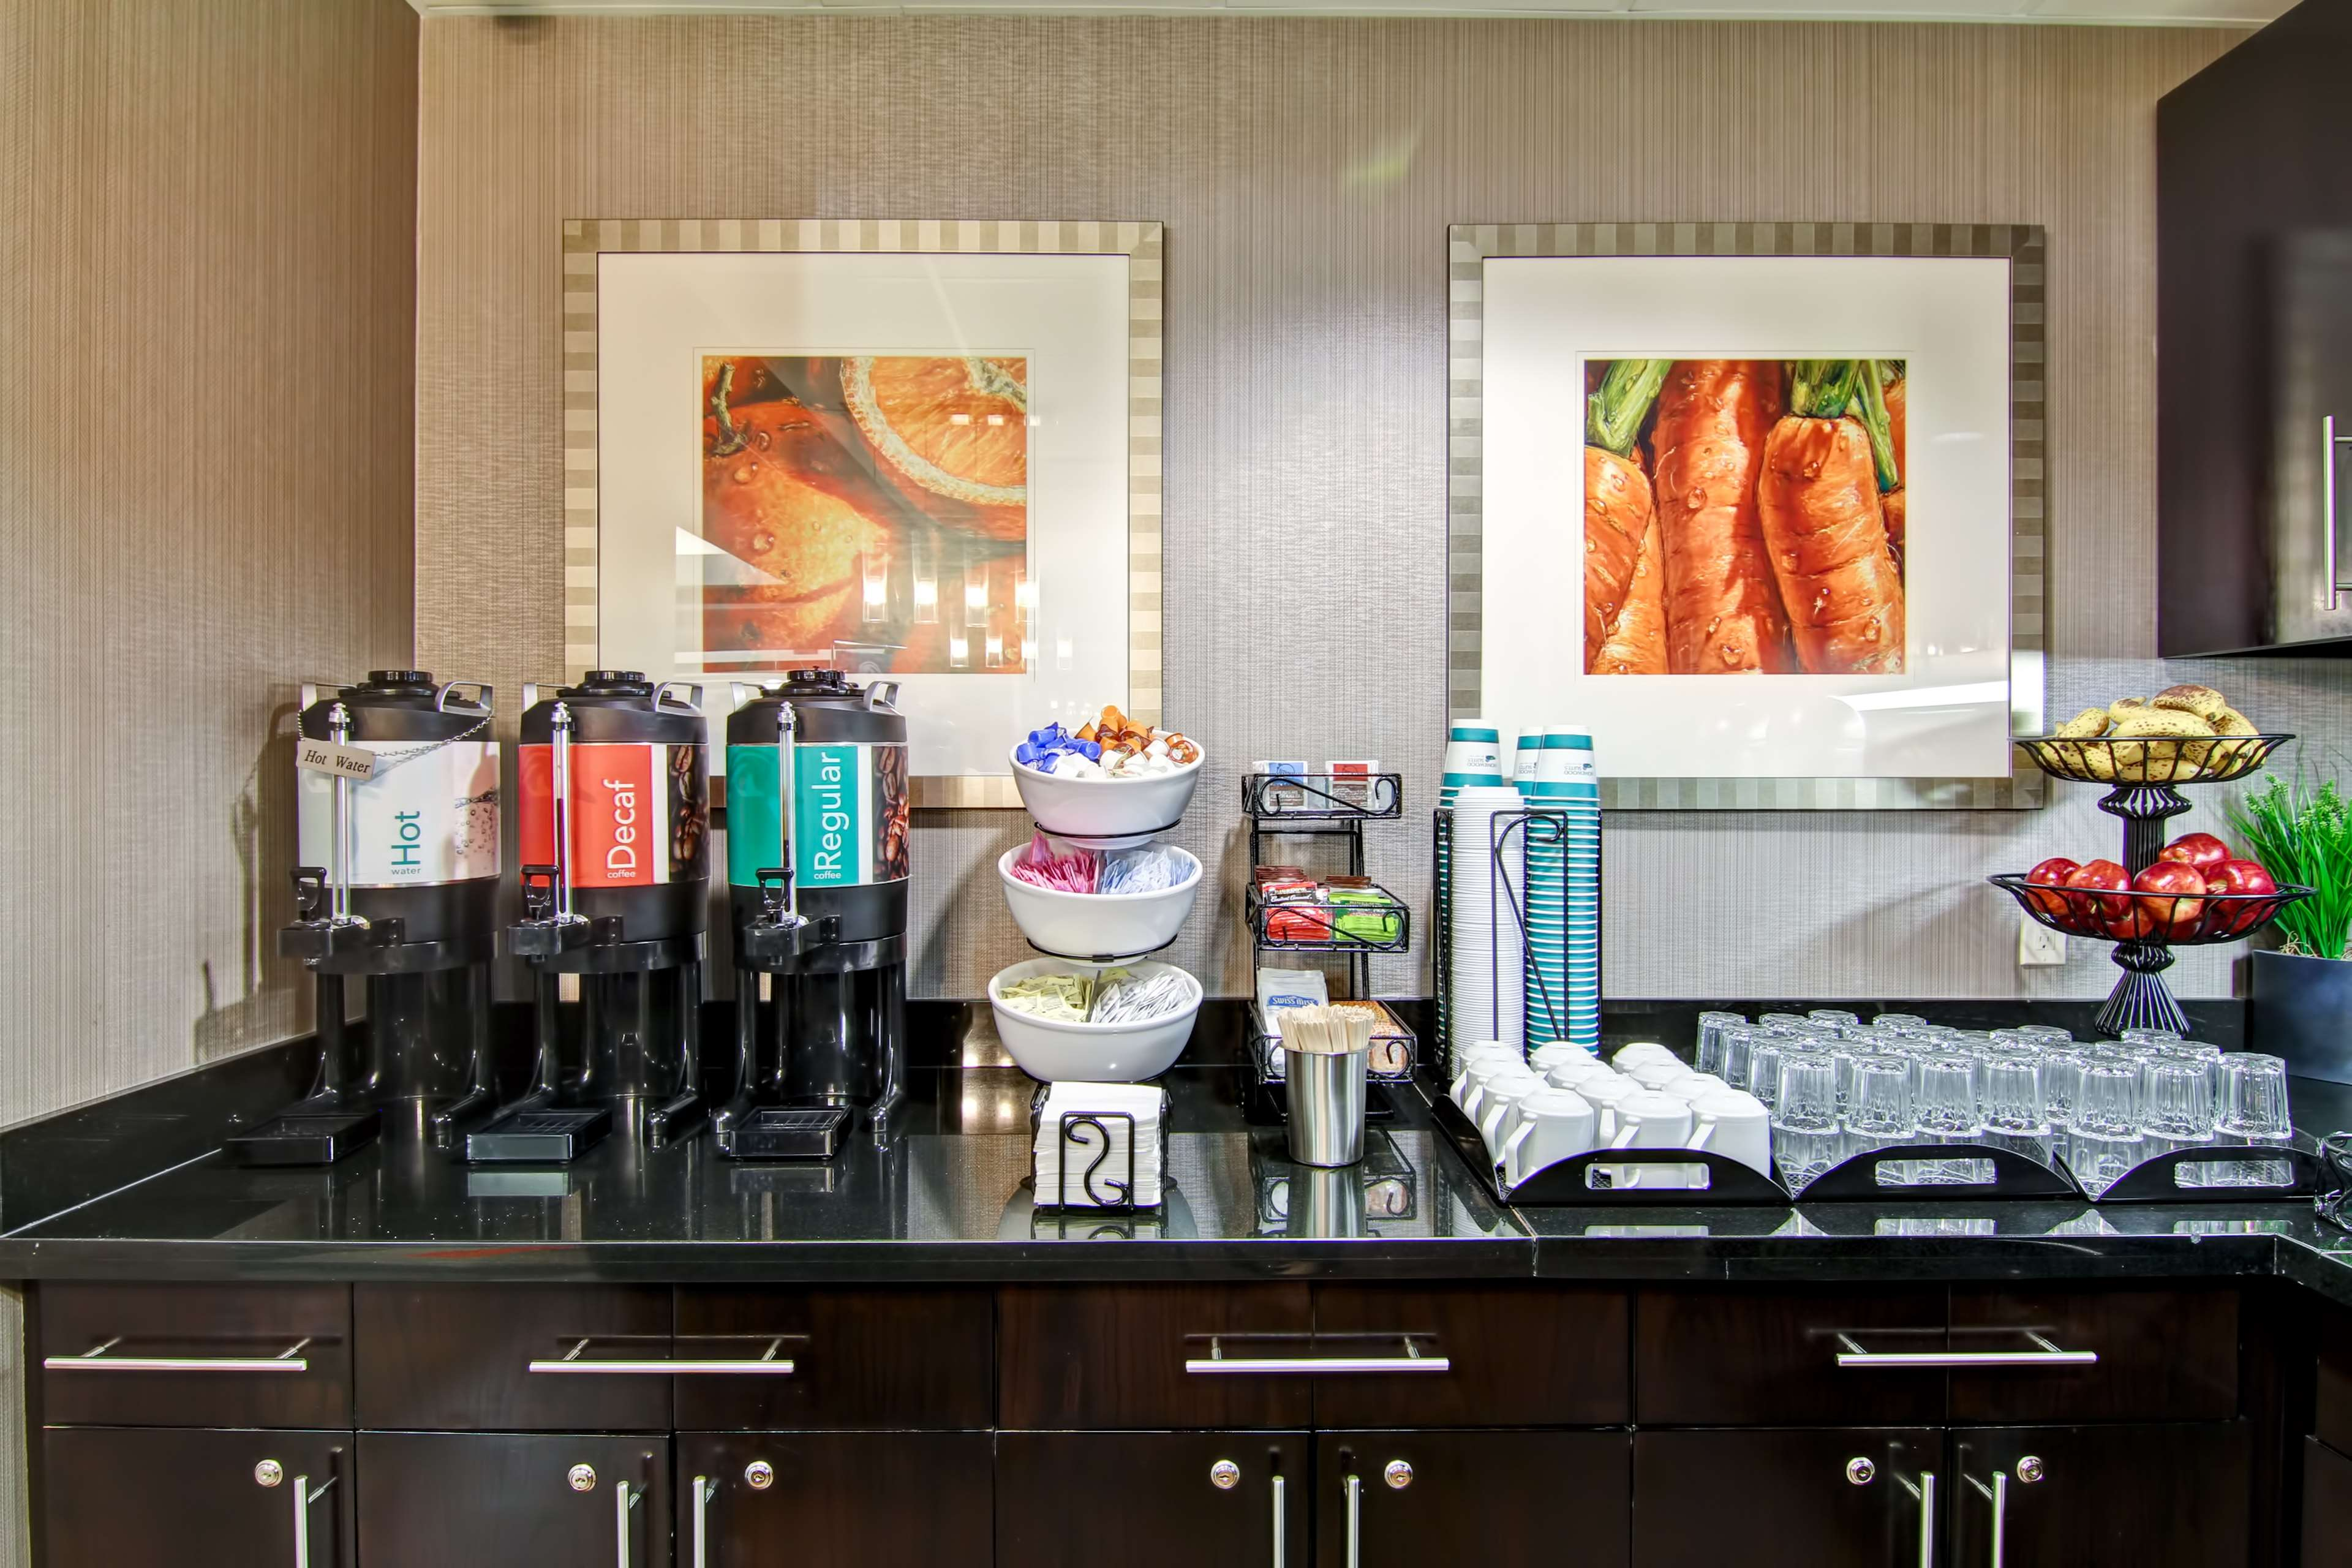 Homewood Suites by Hilton Cincinnati Airport South-Florence image 10